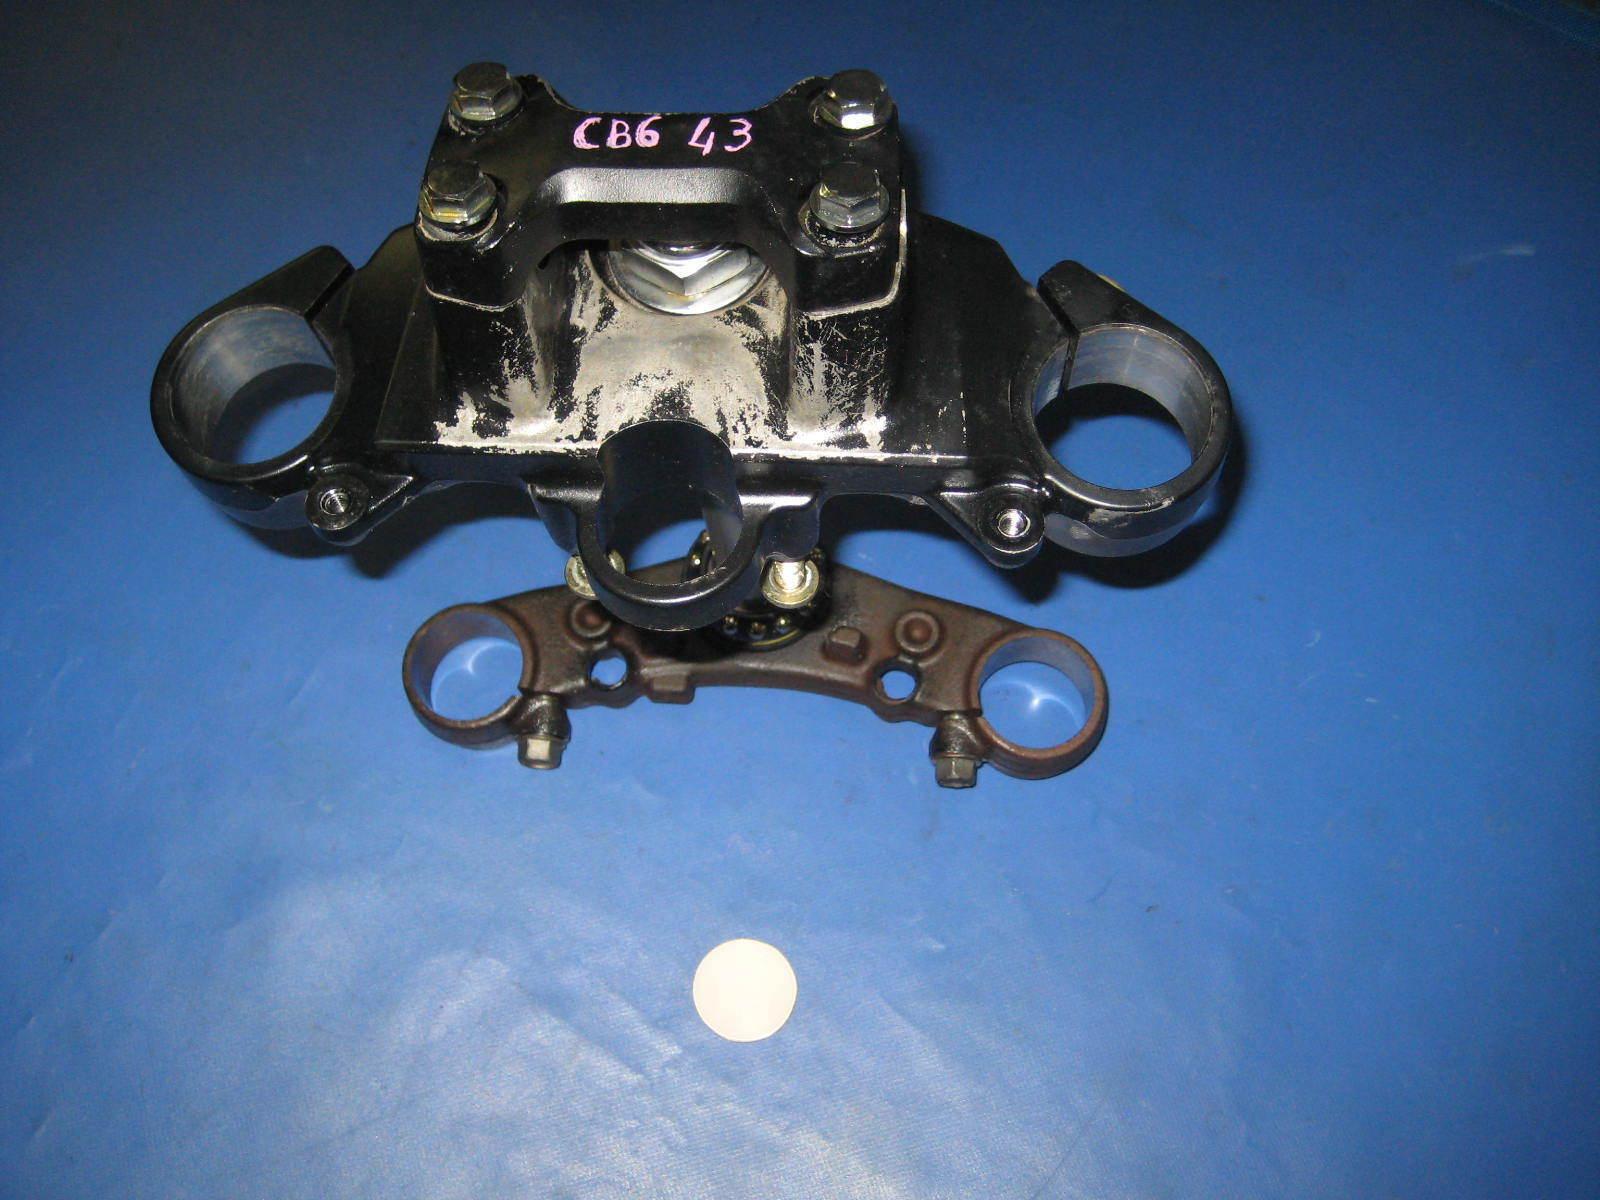 600cc 2005 EURO 22-1020 KIT CUSCINETTI DI STERZO Honda CB600F Hornet ALL BALL